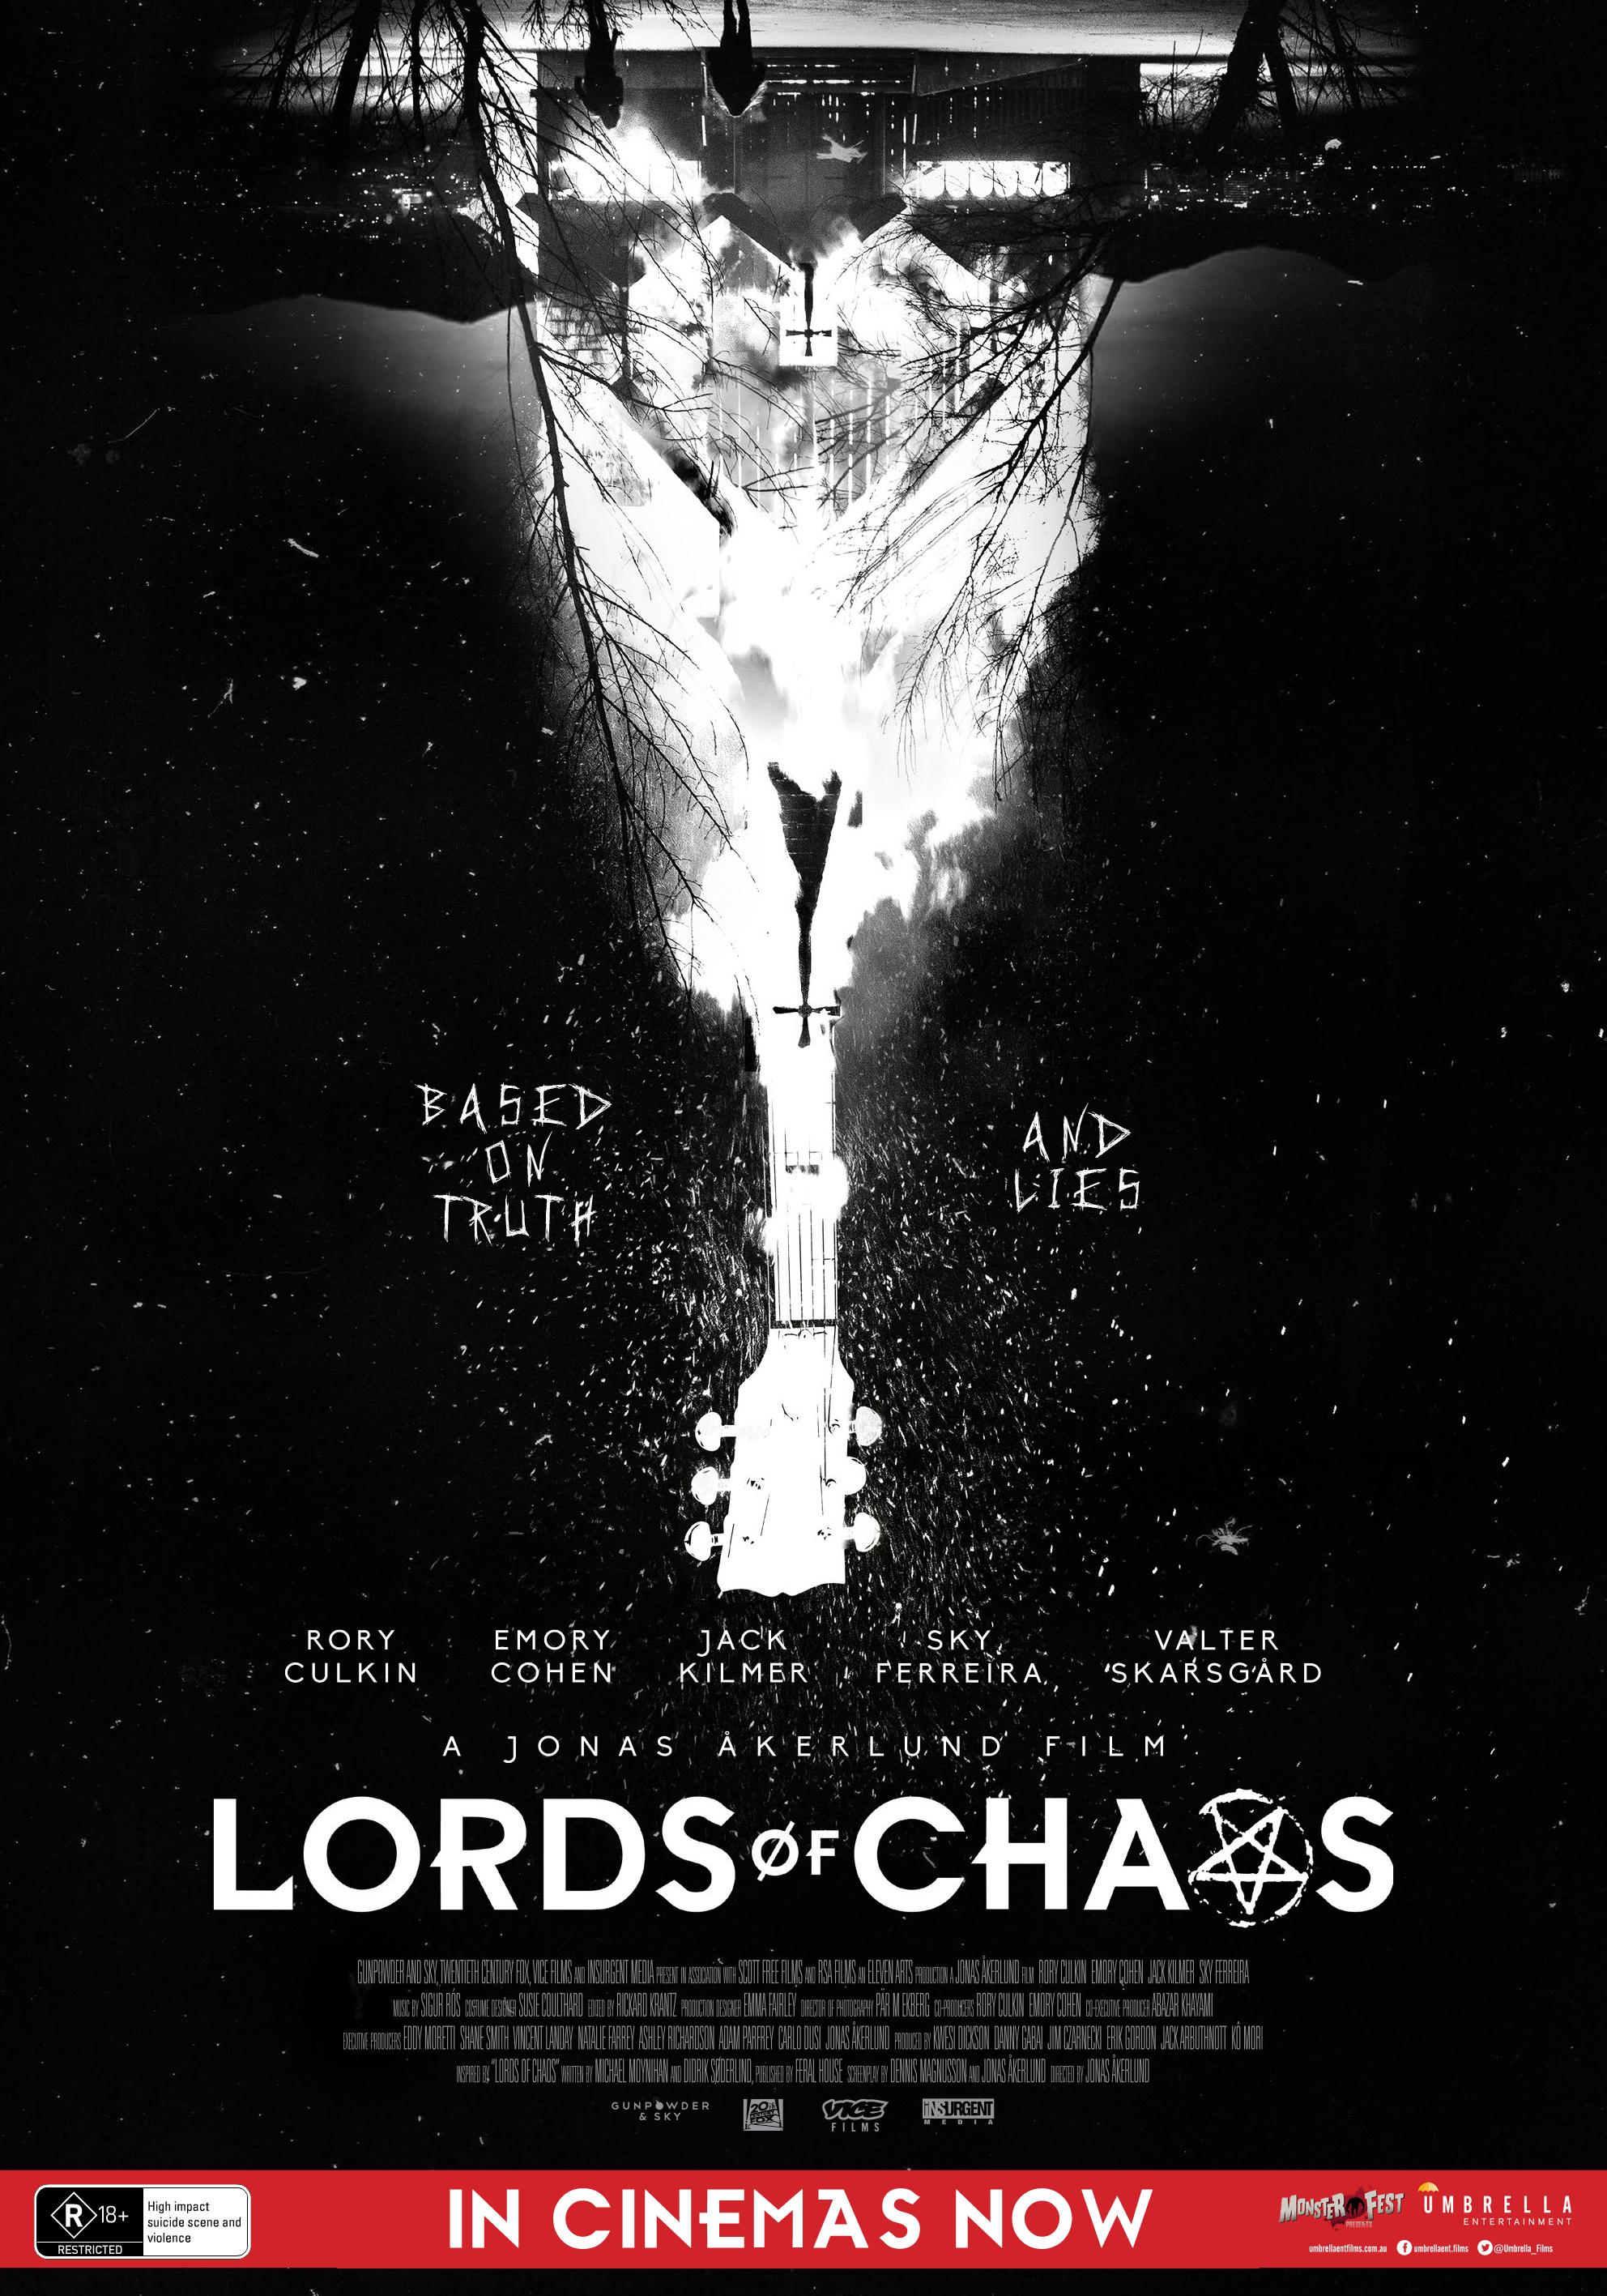 LordsOfChaos-InCinemasNow